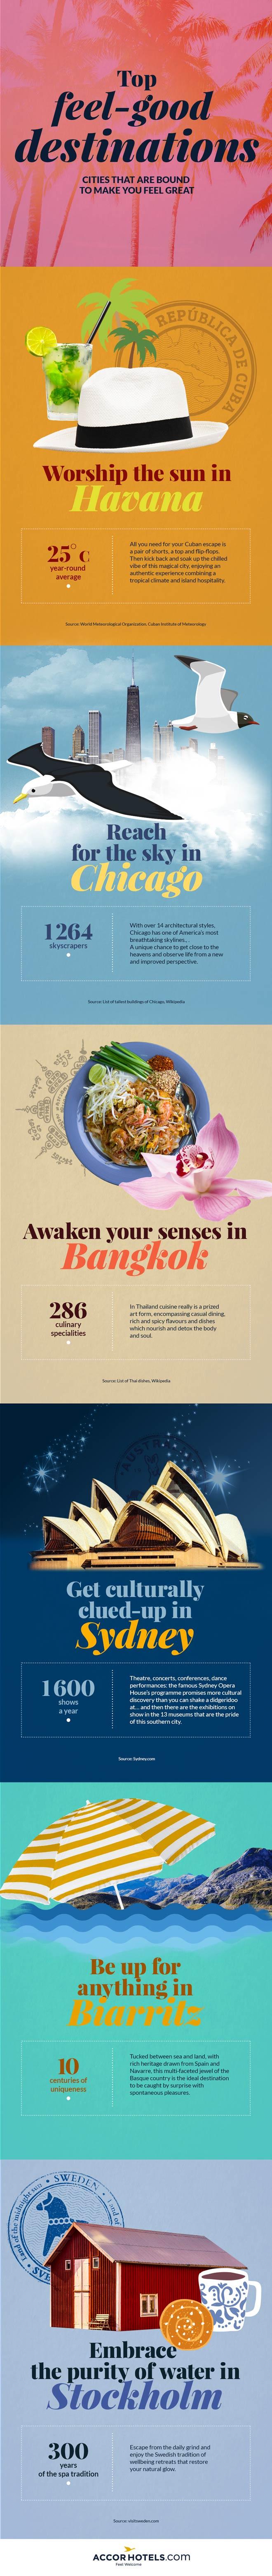 Infographic Top feel-good destinations